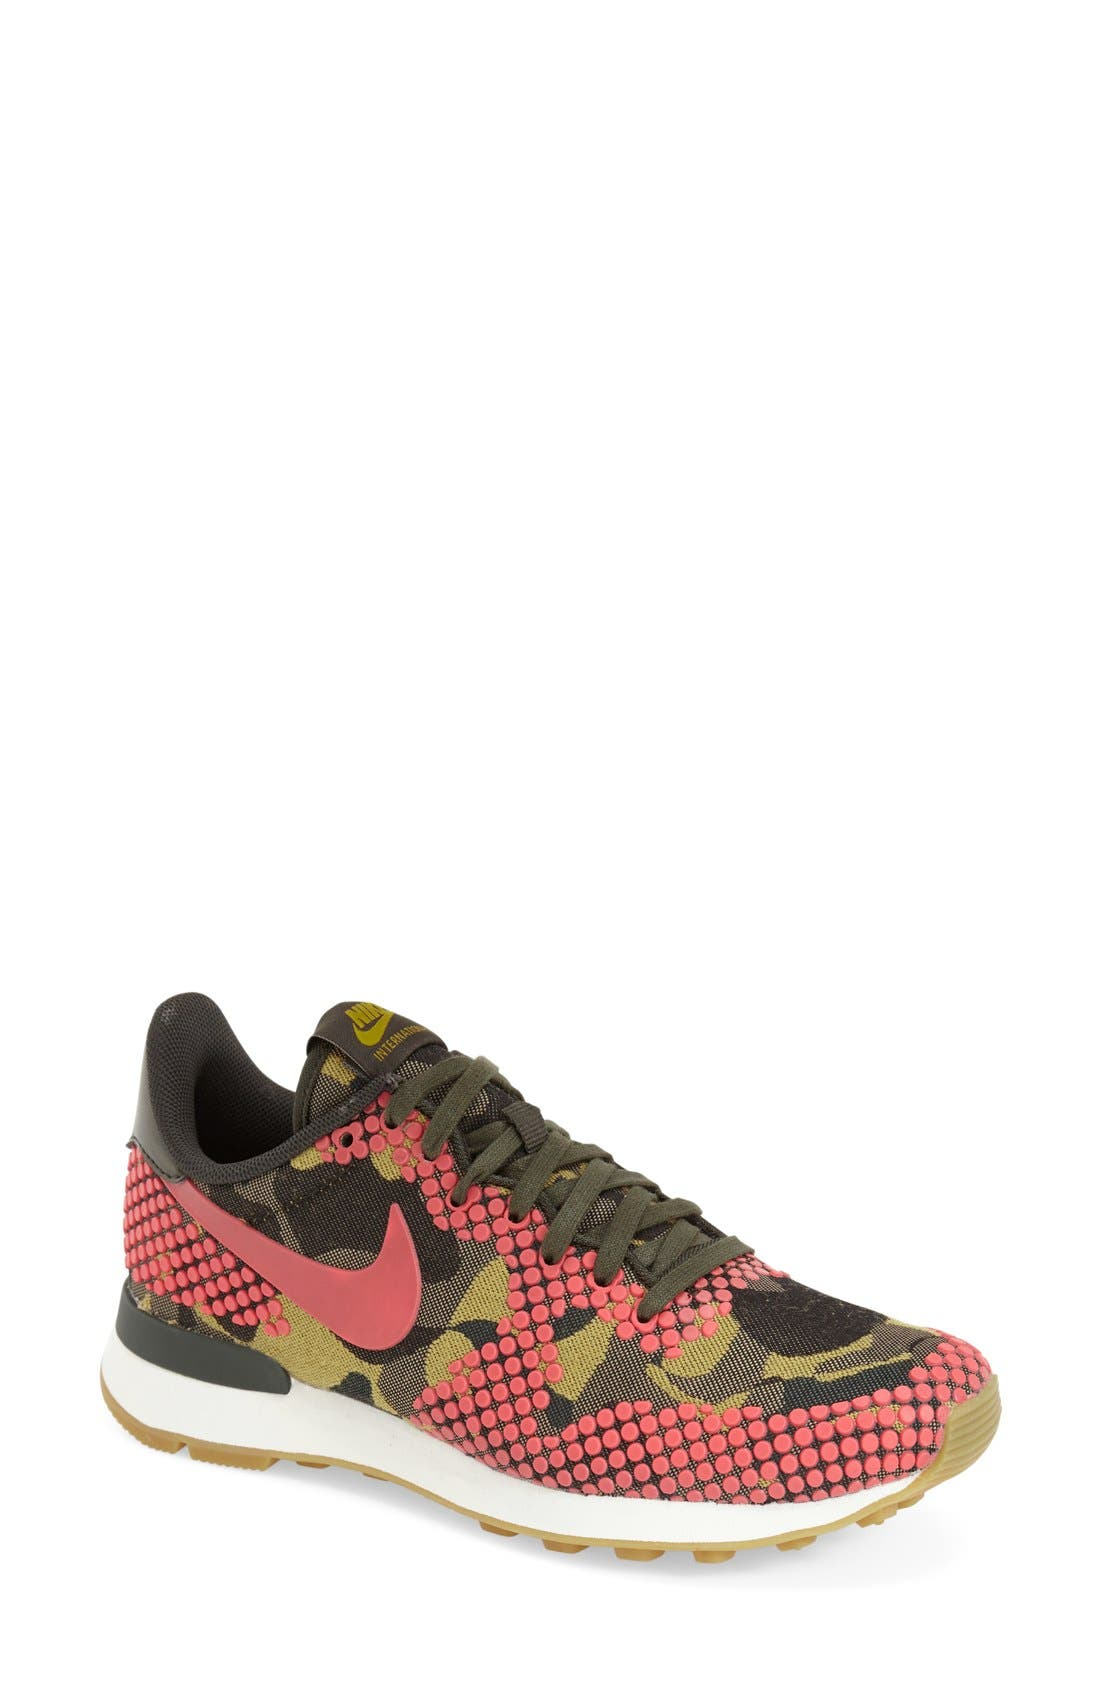 Alternate Image 1 Selected - Nike 'Internationalist' Print Sneaker (Women)